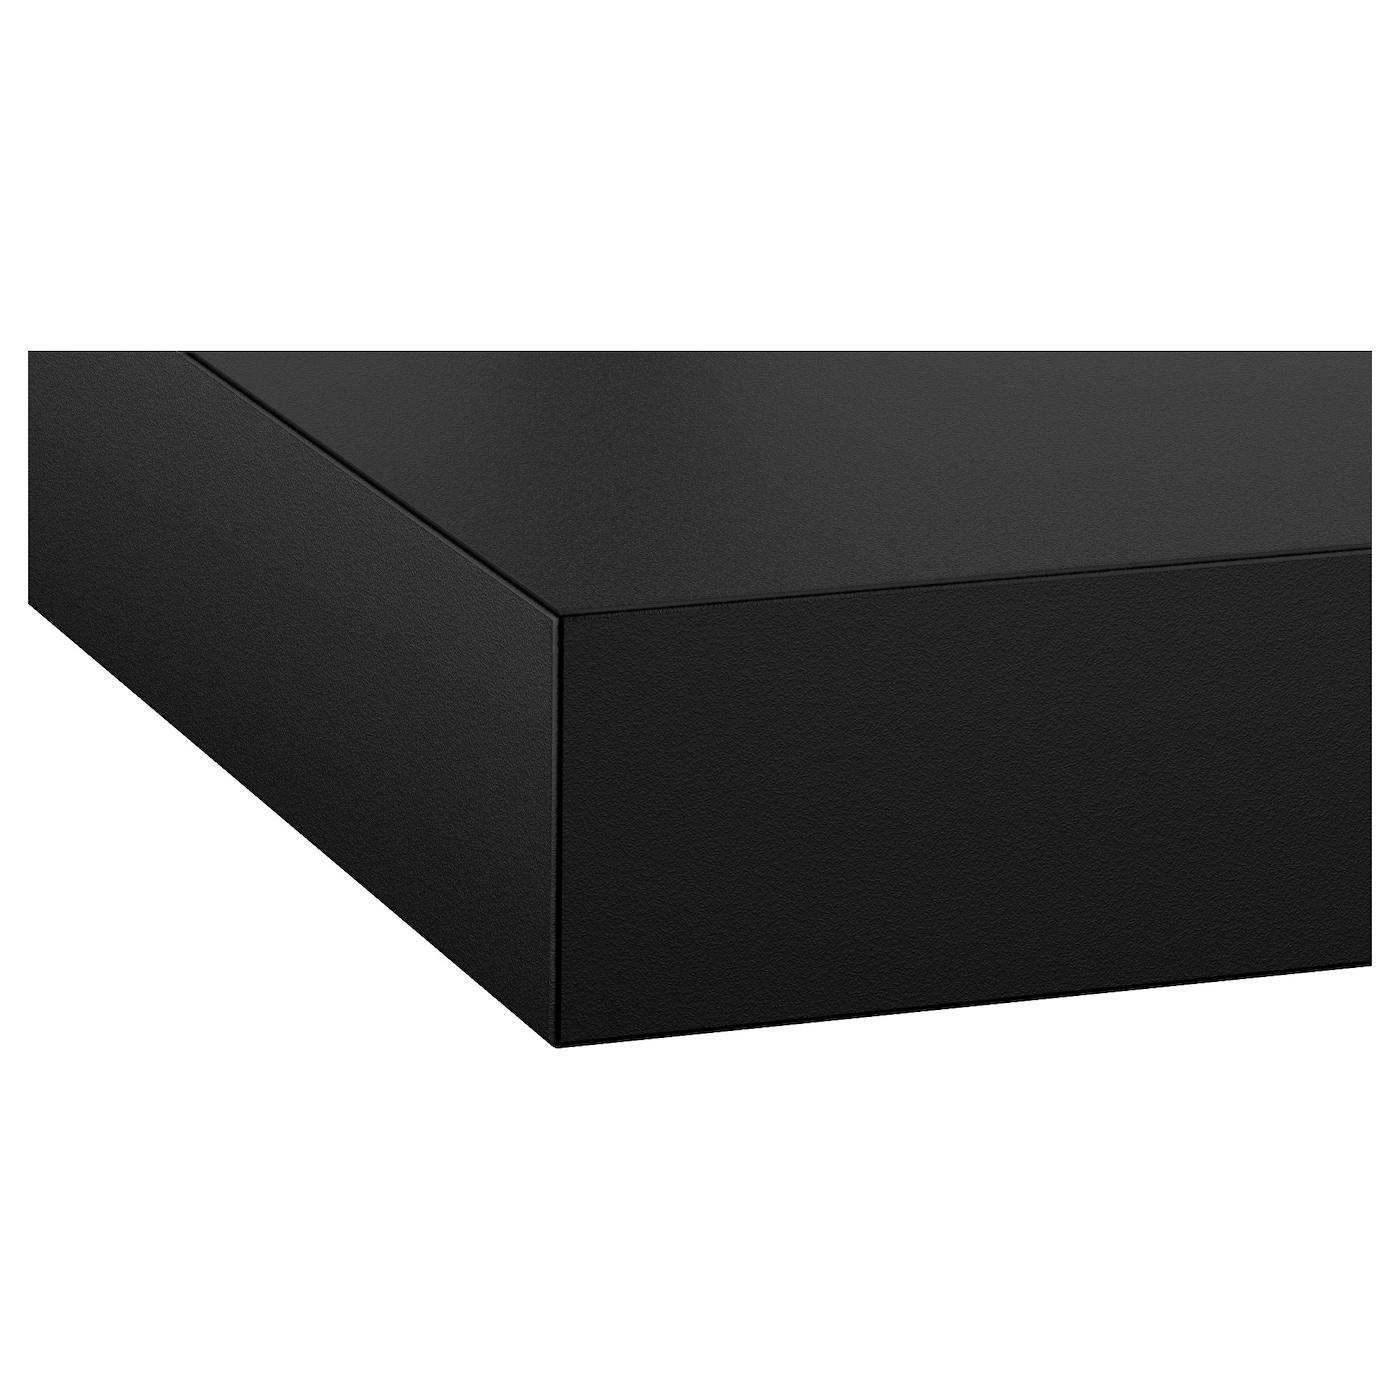 deje plan de travail sur mesure noir stratifi 63 6 125x7 7 cm ikea. Black Bedroom Furniture Sets. Home Design Ideas